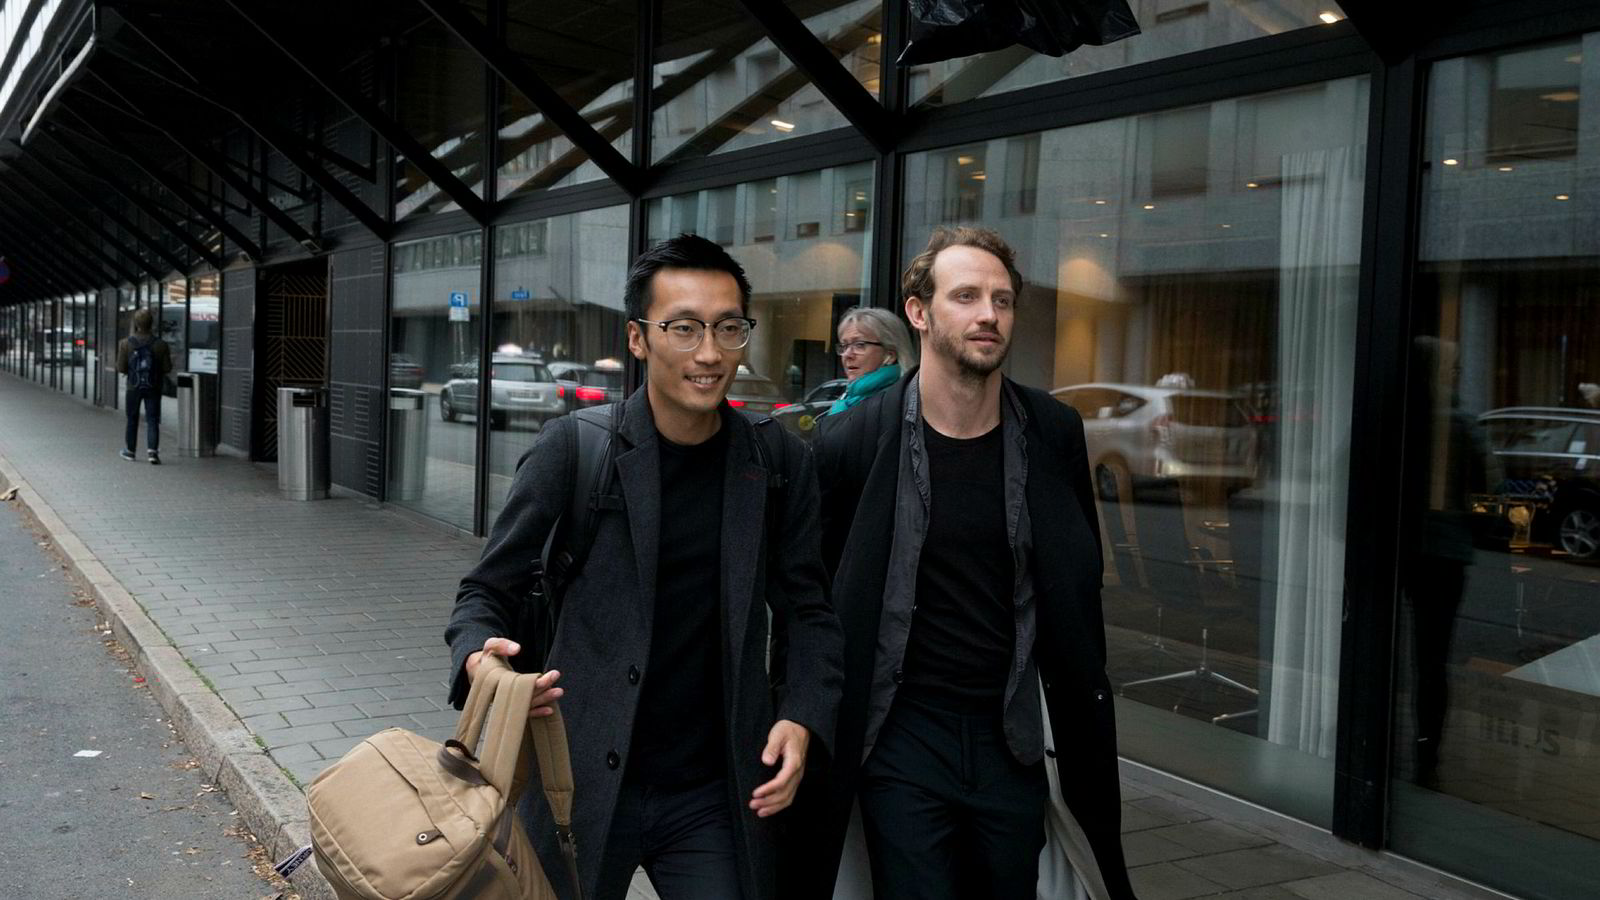 Gründerne Tom Xiong (fra venstre) og Jacob Lovén deltok på Dagens Næringslivs fintech-konferanse denne uken.